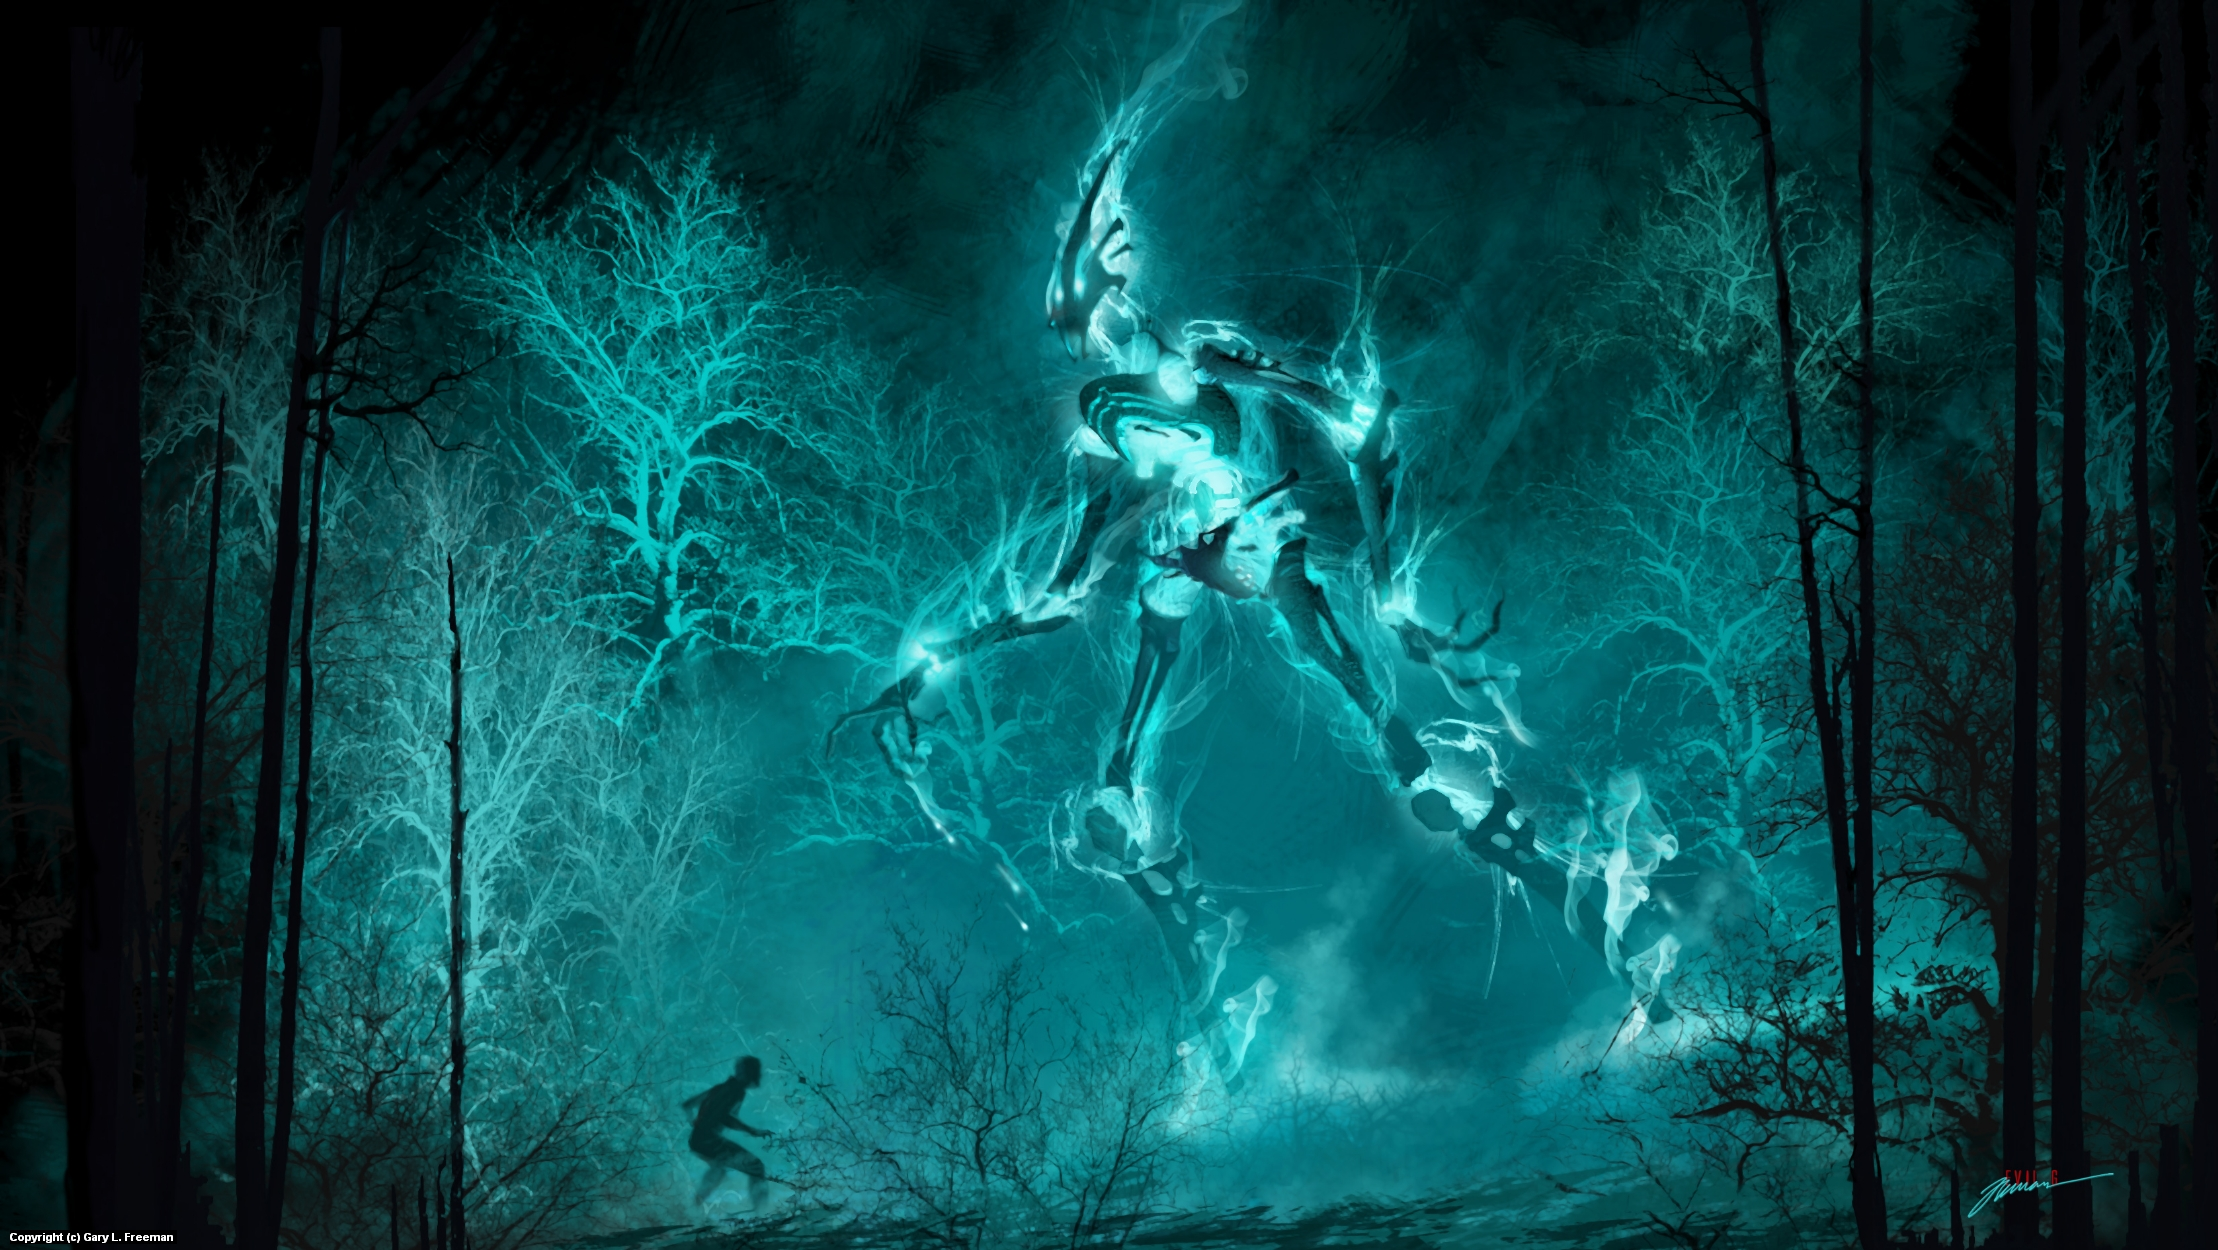 Specter Artwork by Gary Freeman